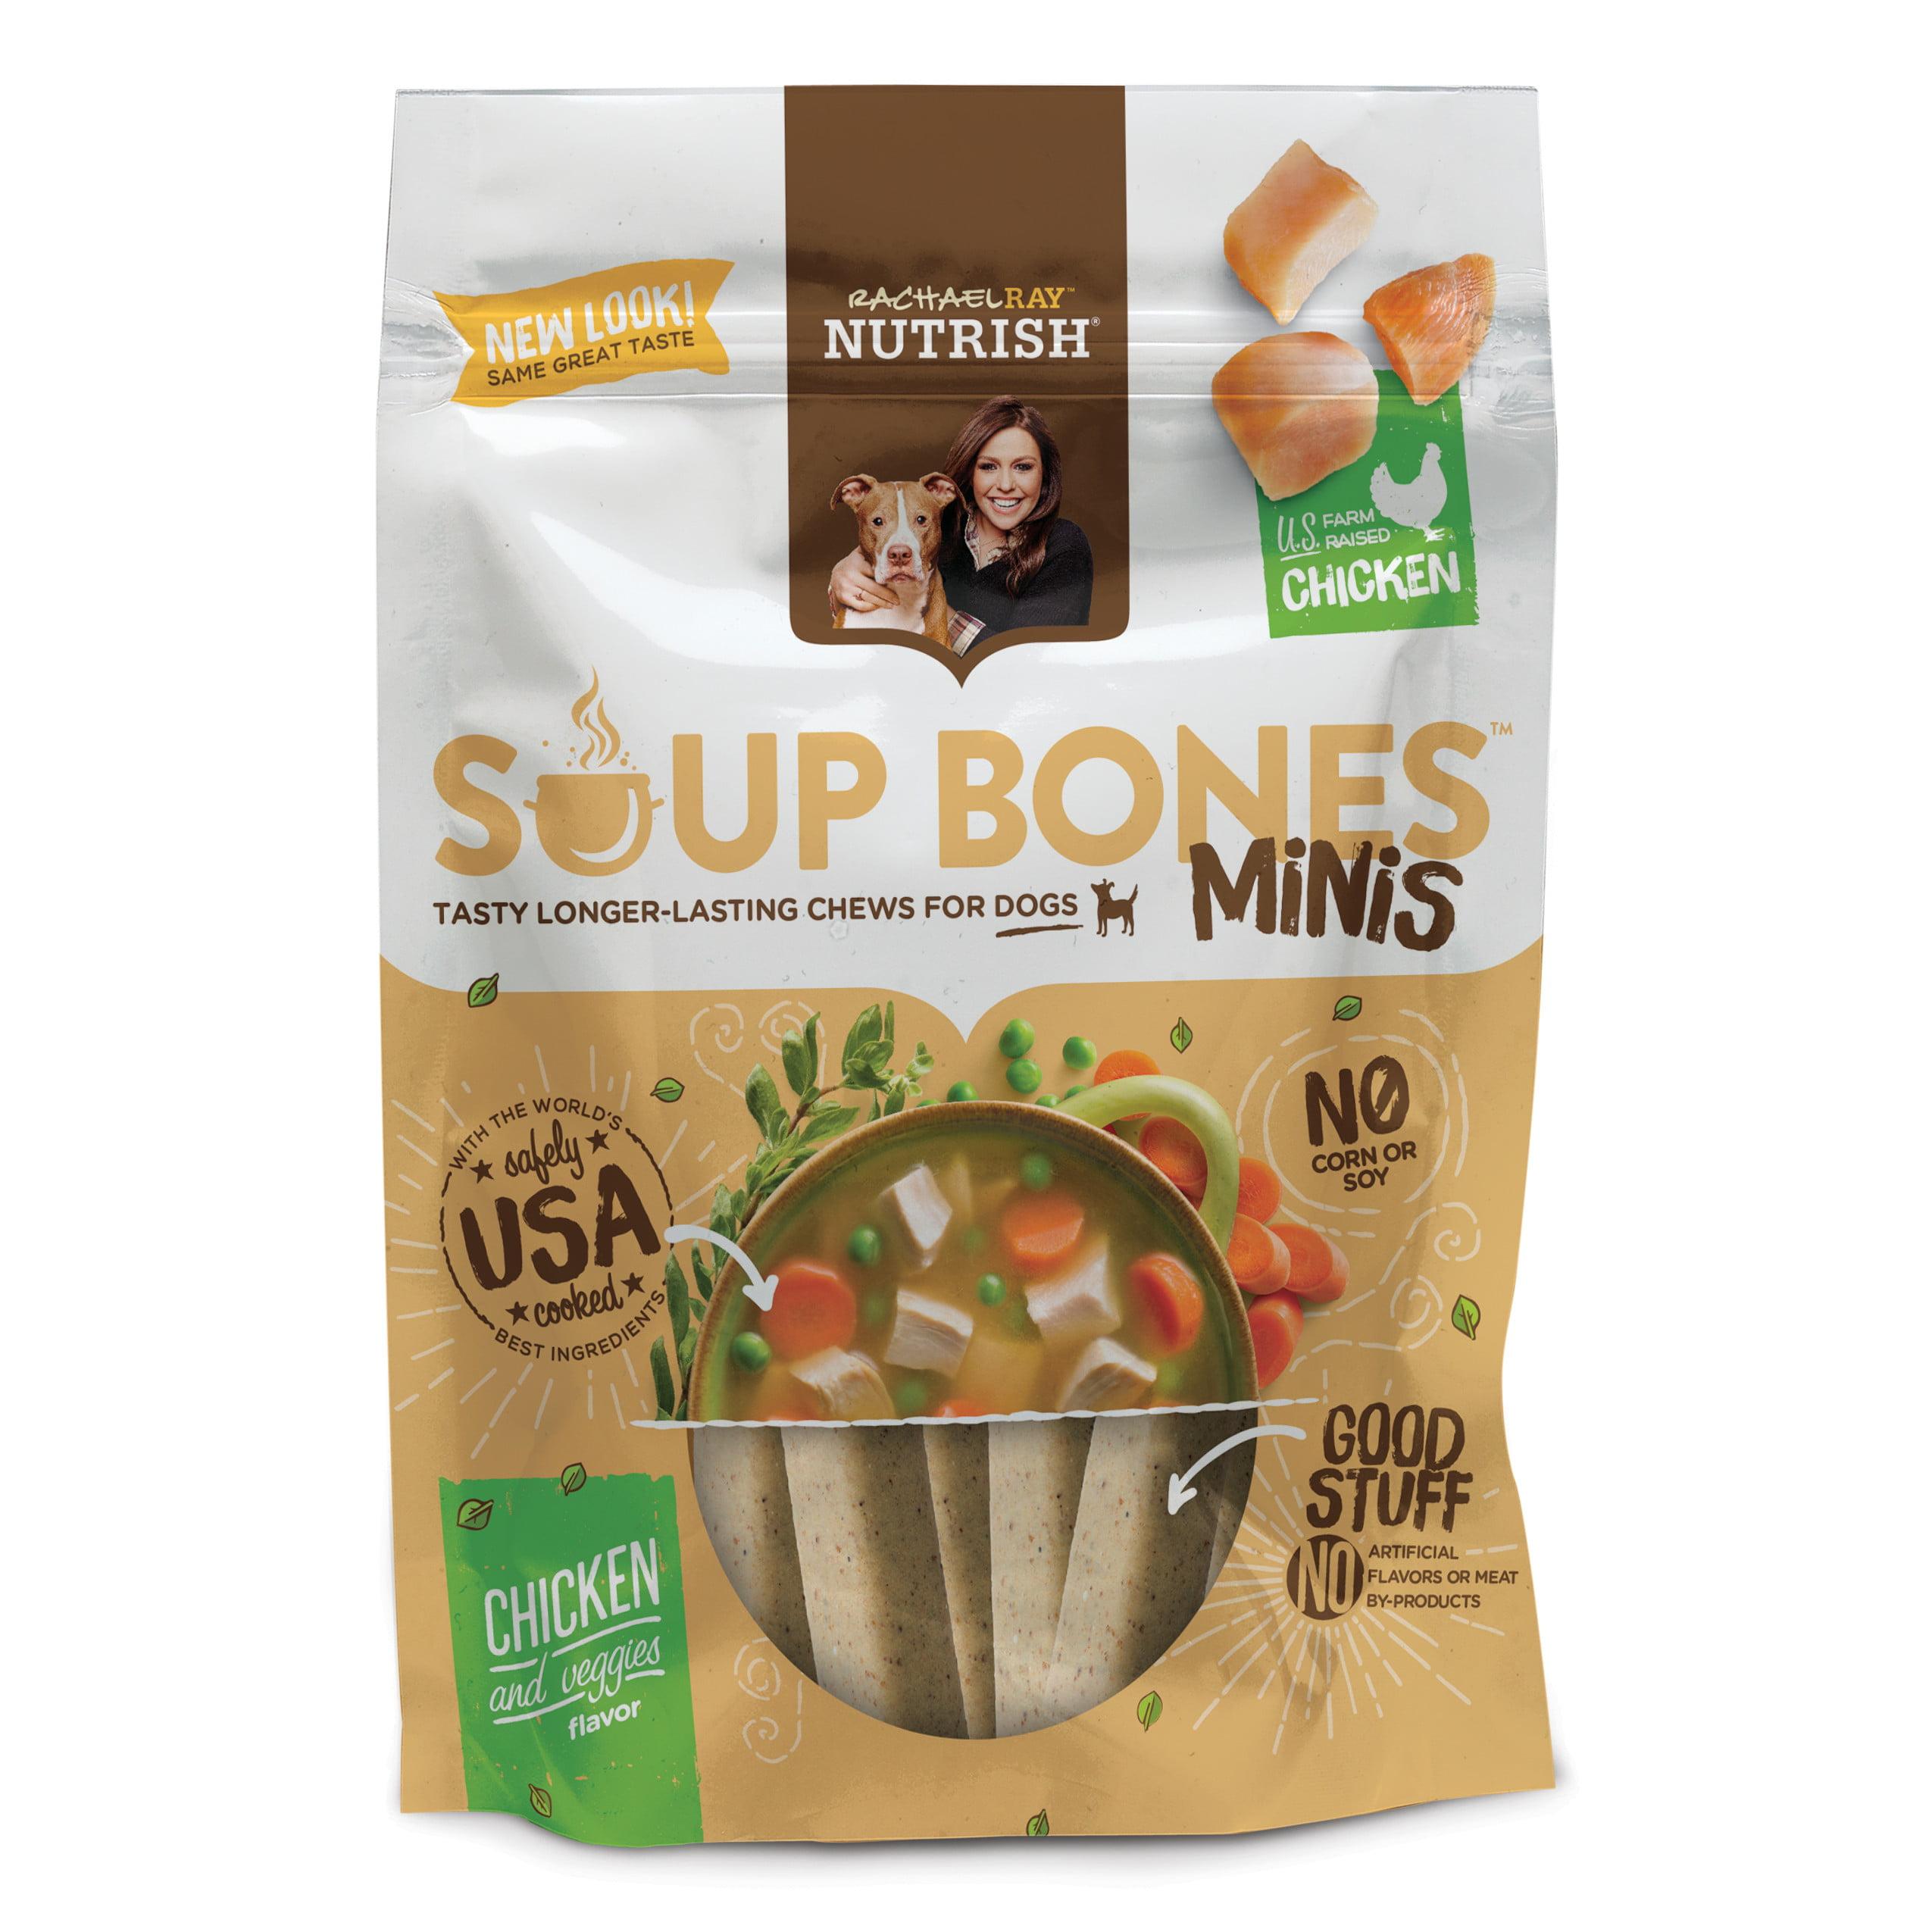 Rachael Ray Nutrish Soup Bones Minis Dog Treats, Chicken & Veggies Flavor, 4.2oz by AINSWORTH PET NUTRITION